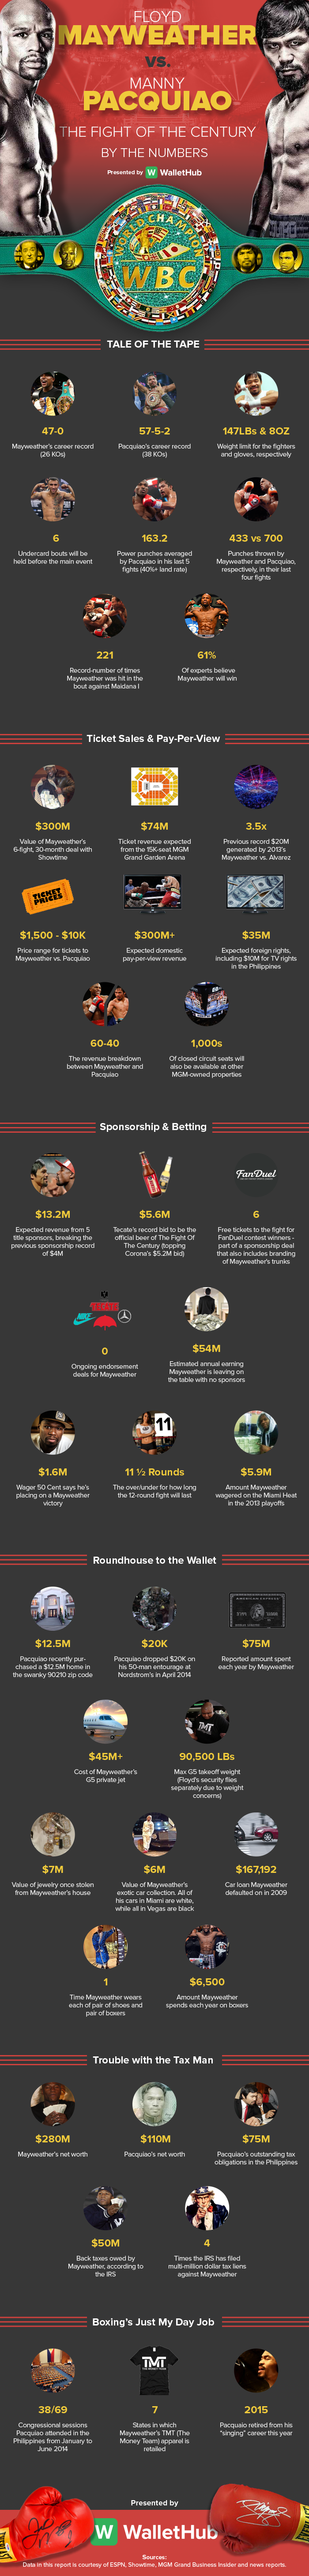 Mayweather-vs-Pacquiao-Infographic